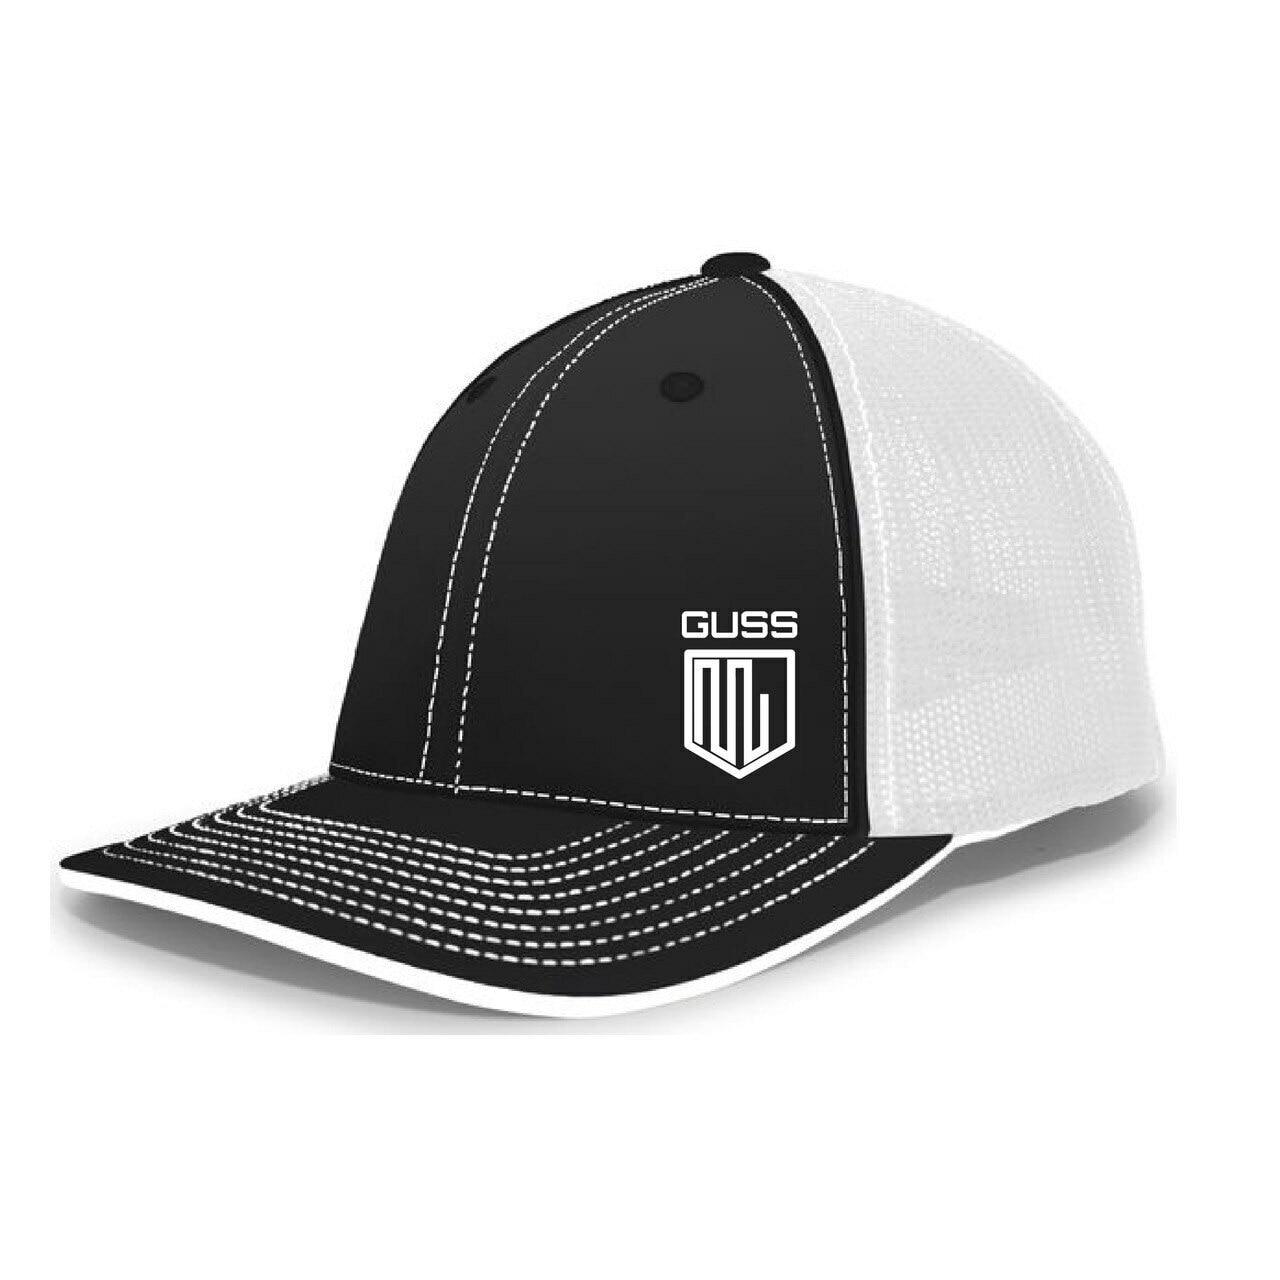 Pacific Headwear Trucker Flexfit® Cap - Black & White